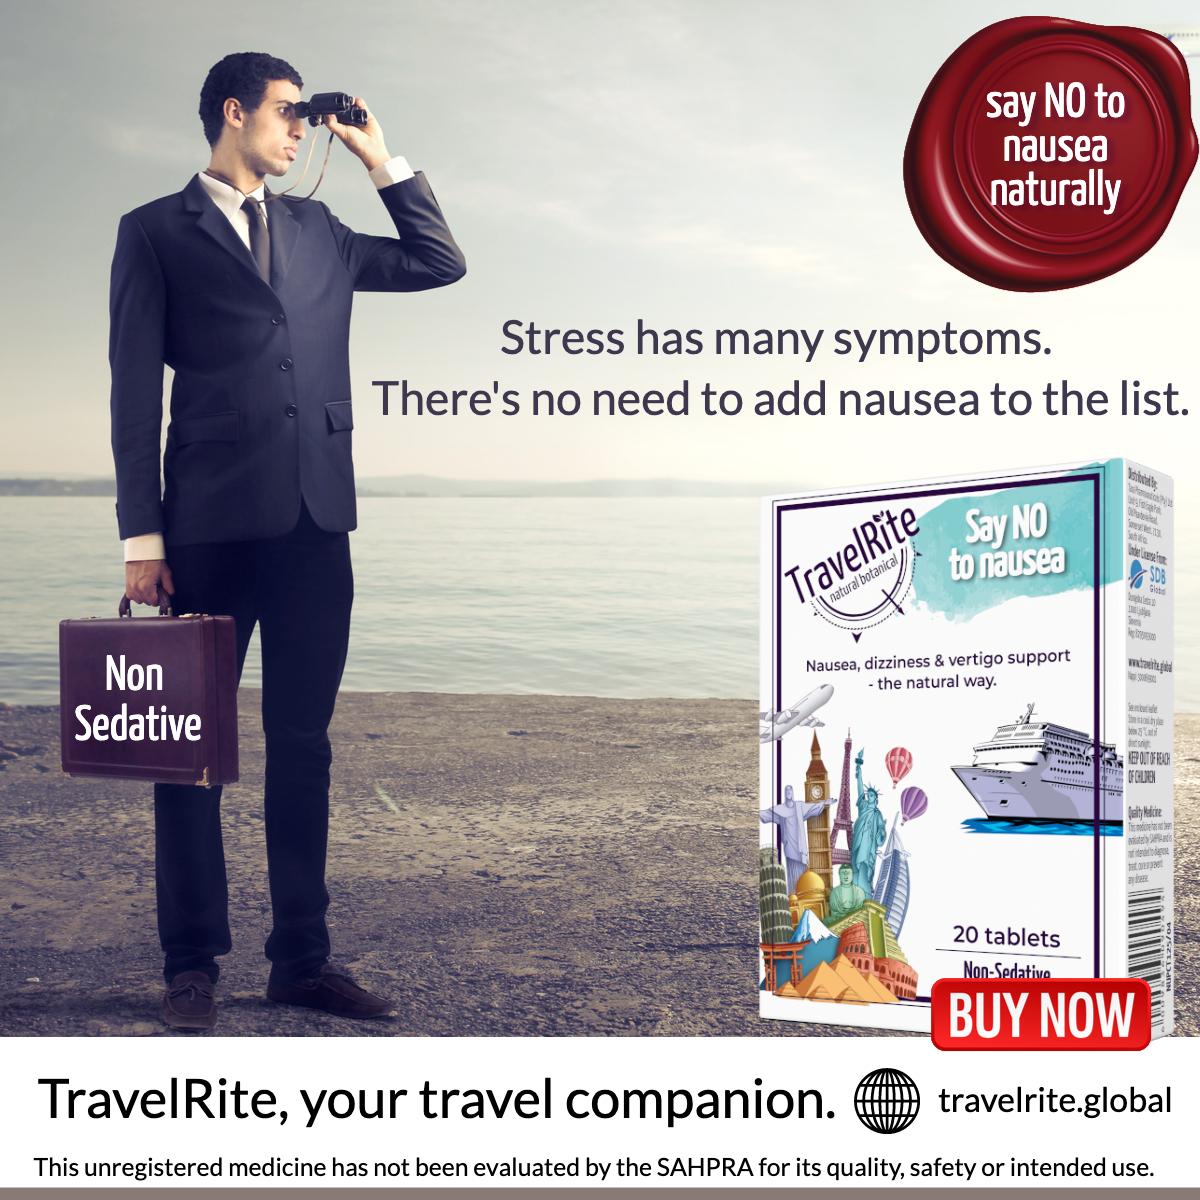 TravelRite stress nausea